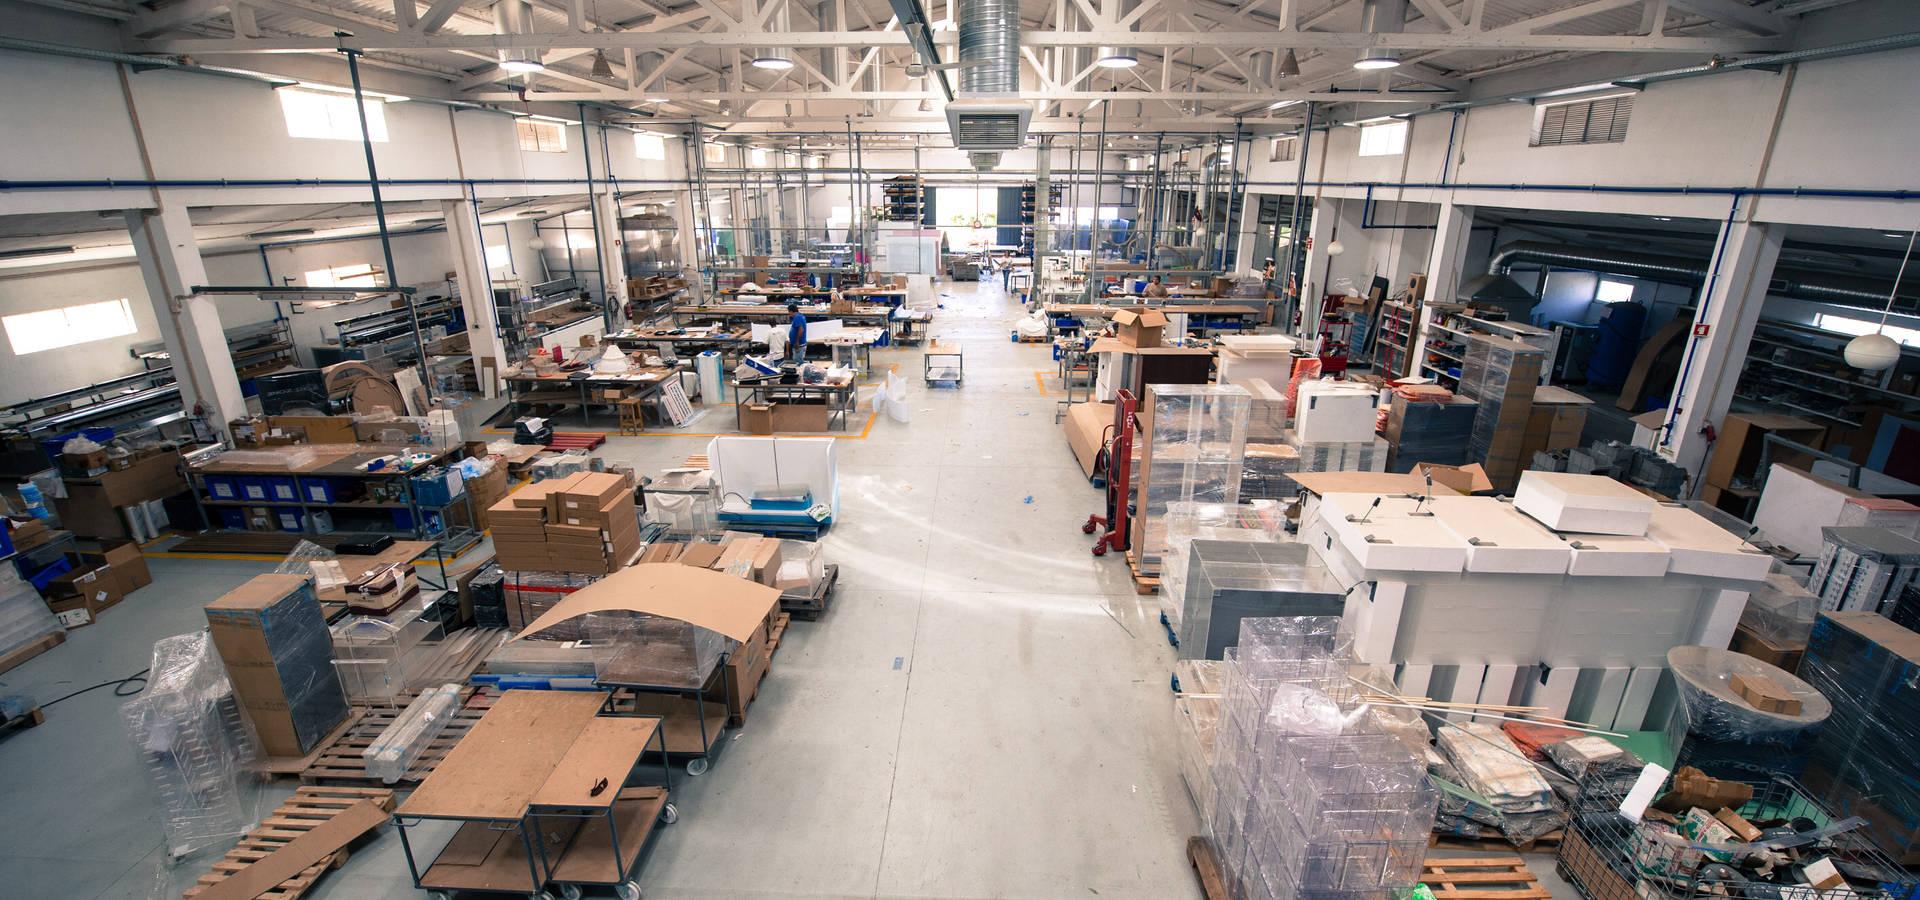 Urby – Industria de Mobiliário by Acrilmolde